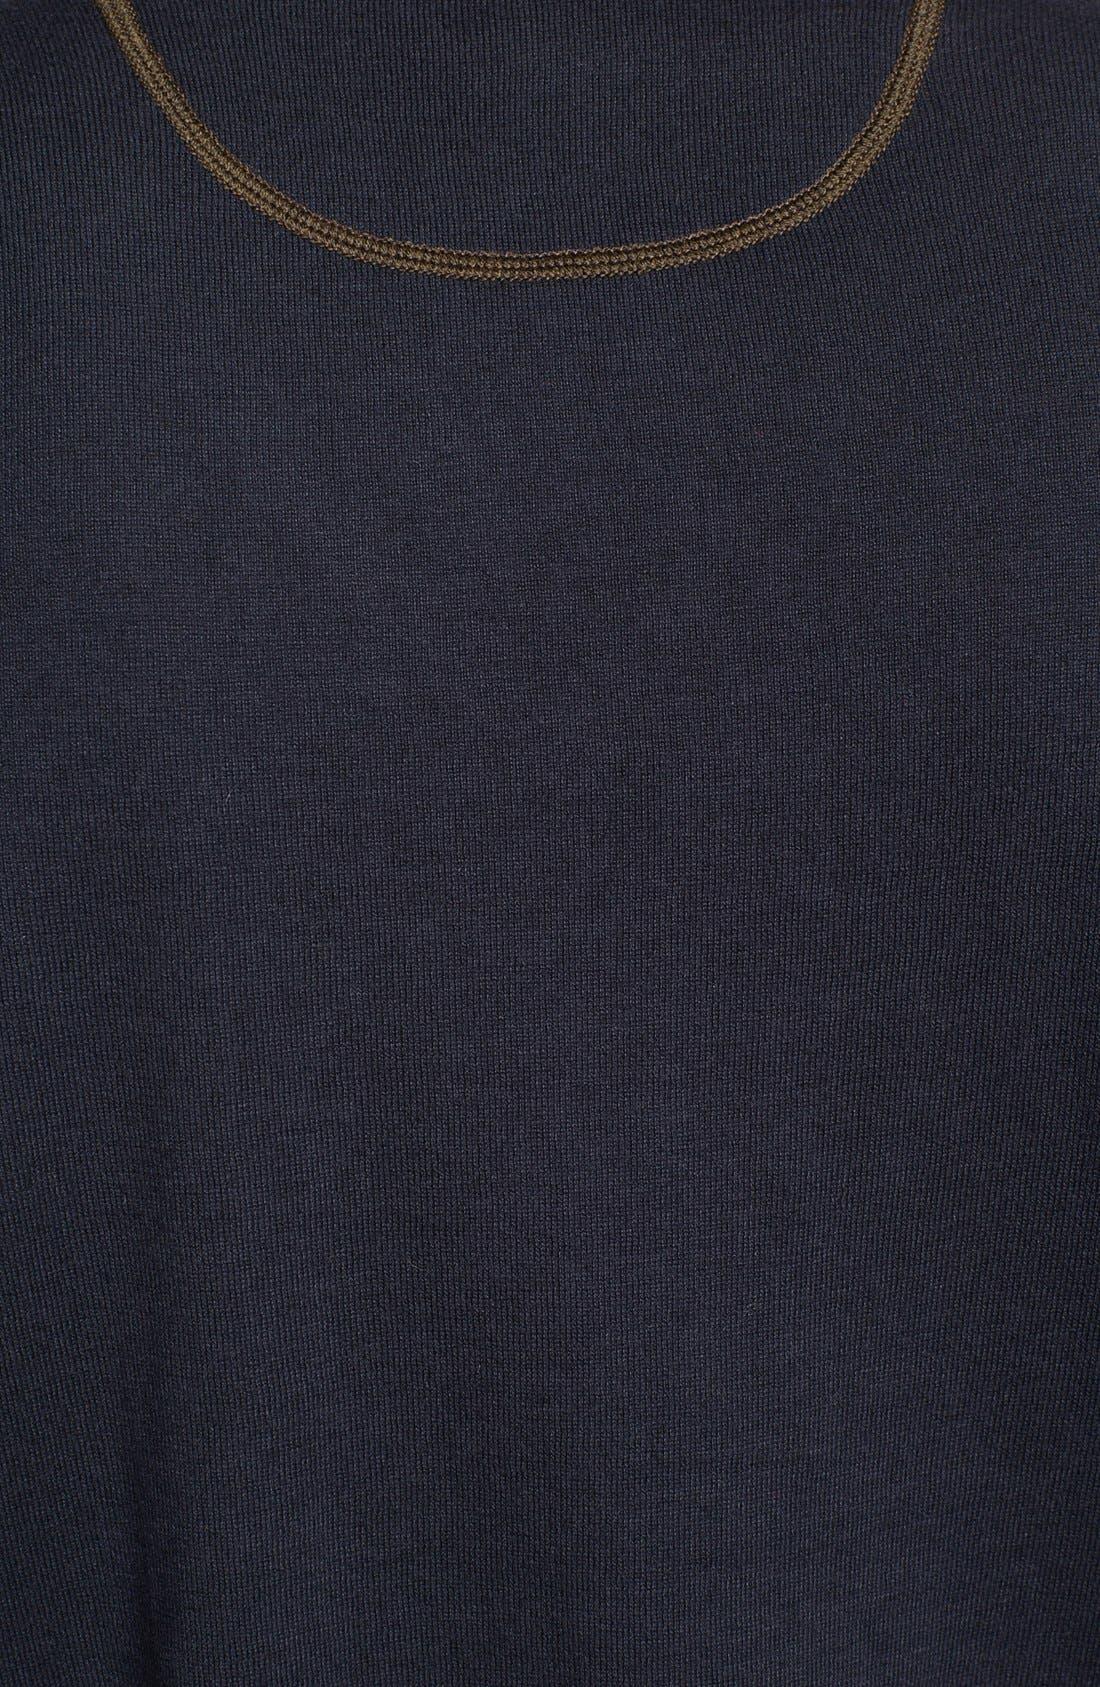 Alternate Image 3  - BOSS Orange 'Accel' V-Neck Sweater